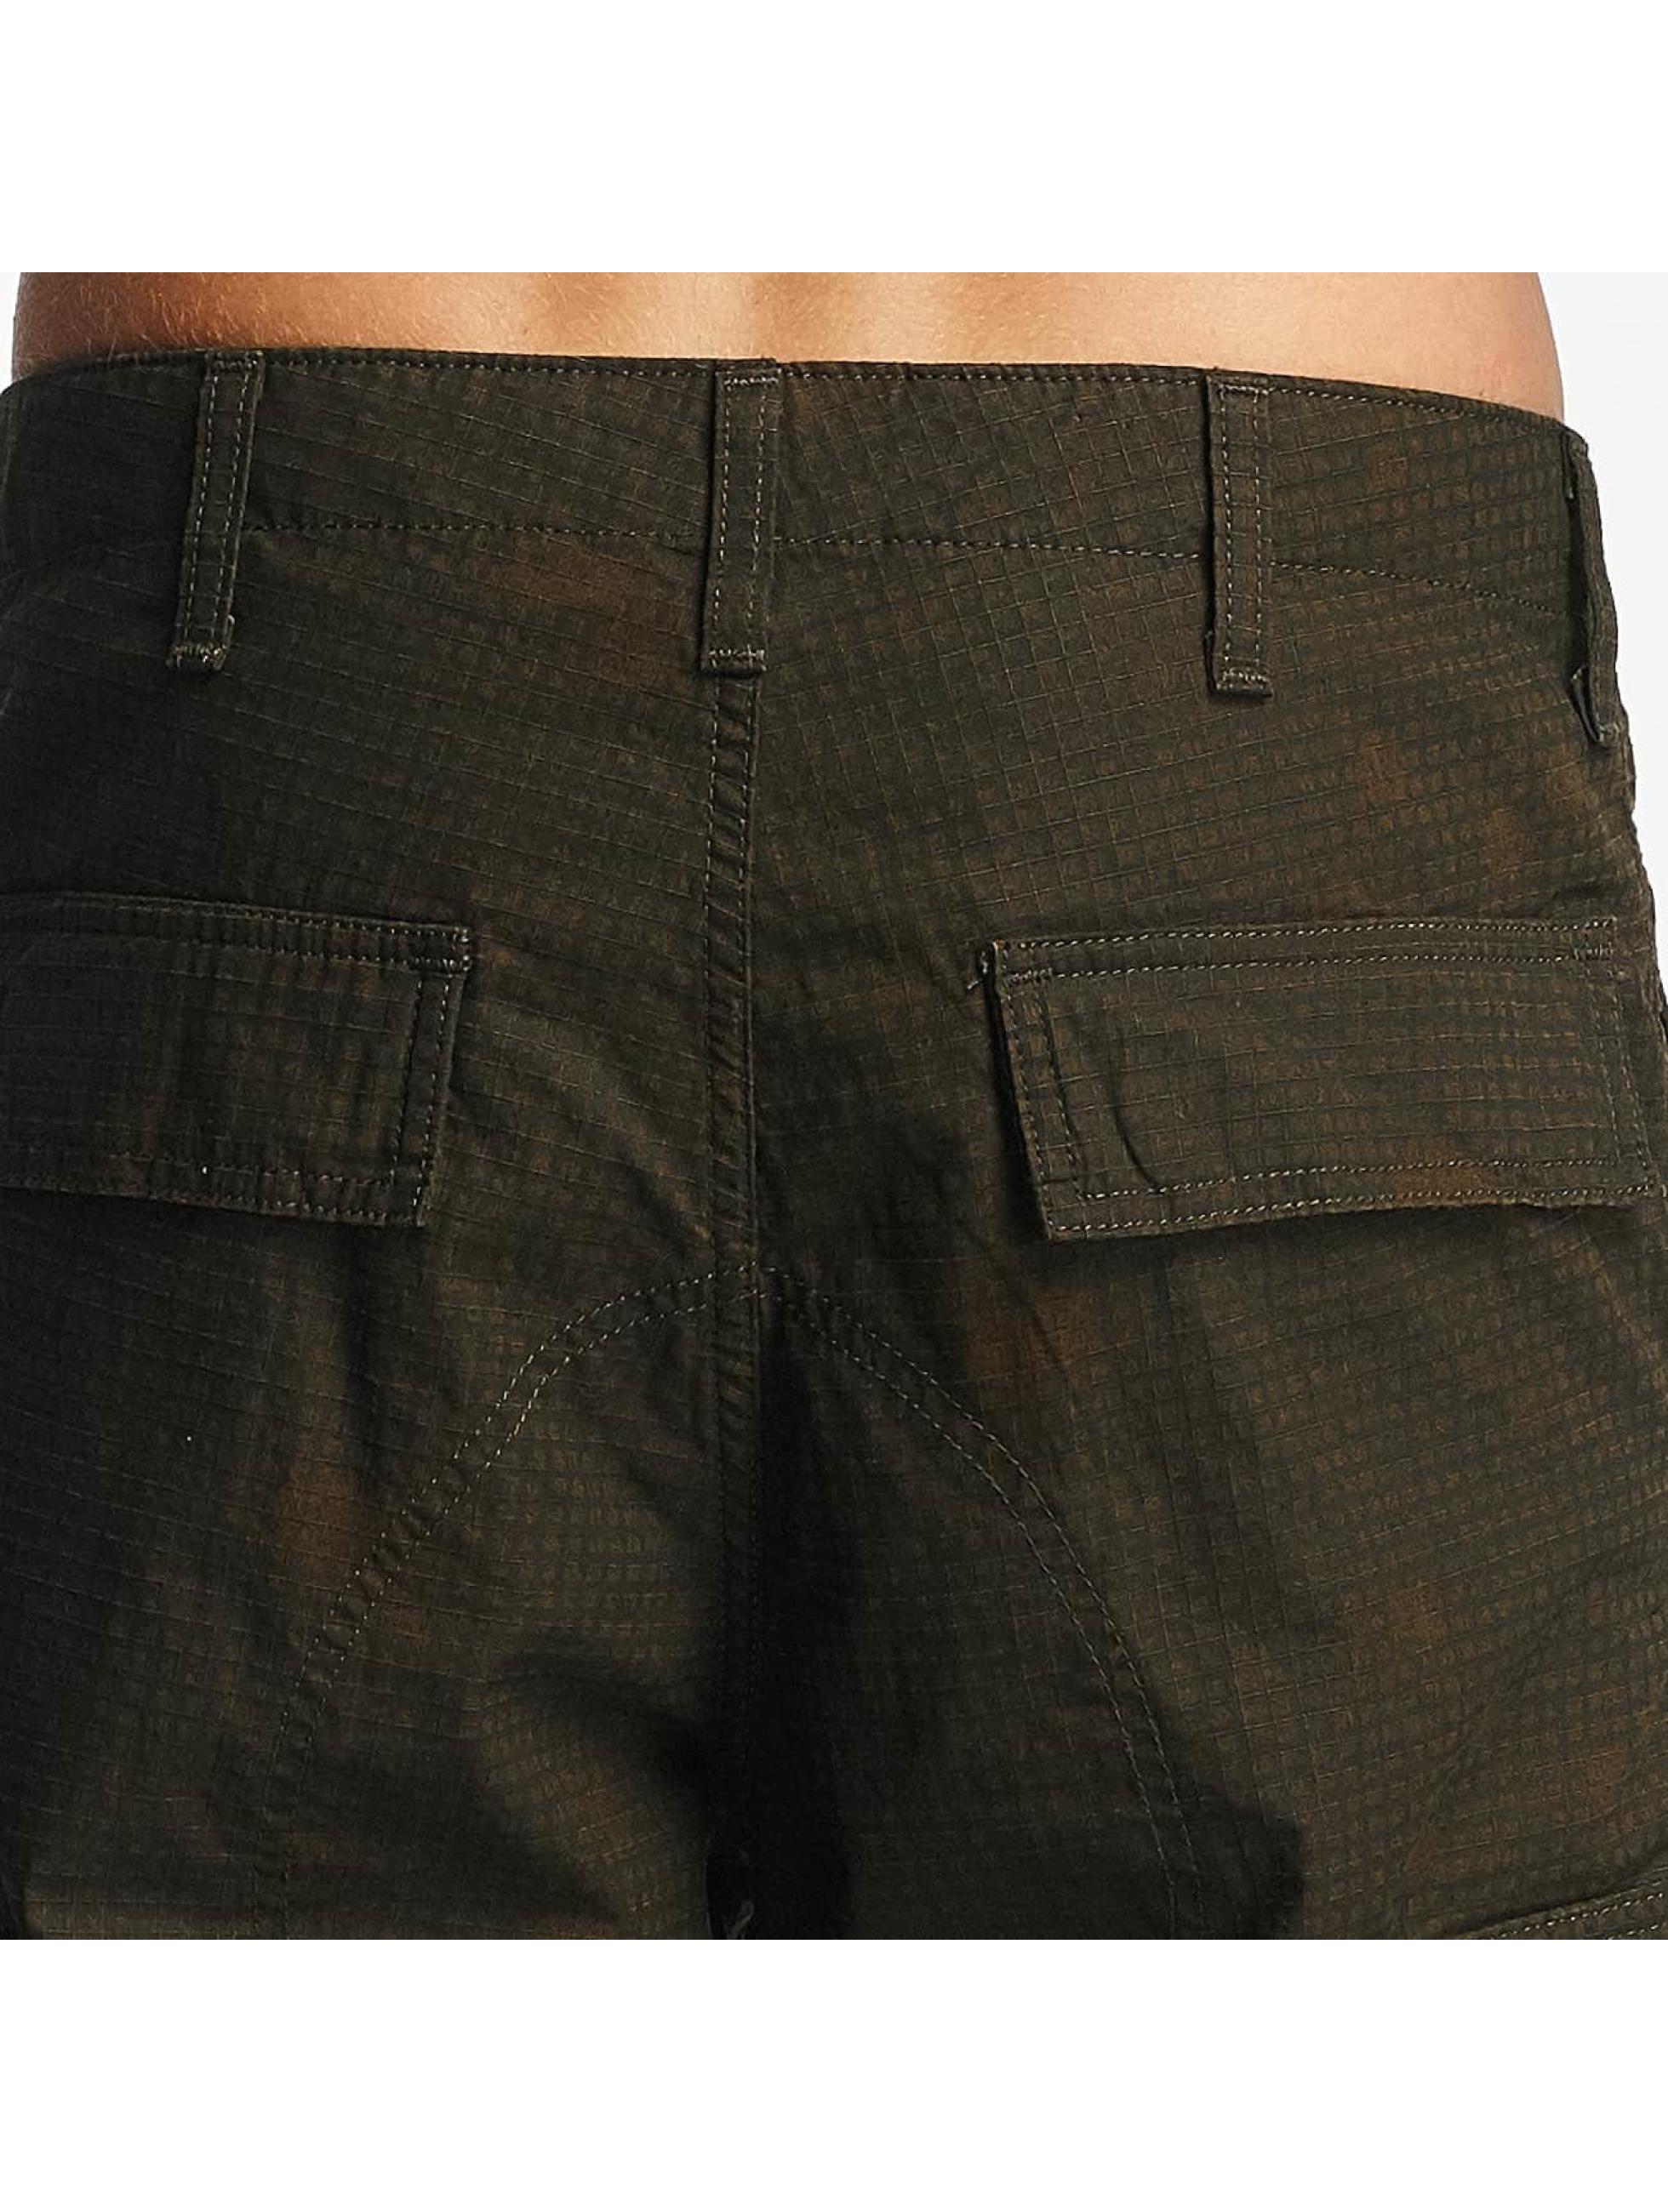 Carhartt WIP Chino bukser Columbia Regular Fit grøn